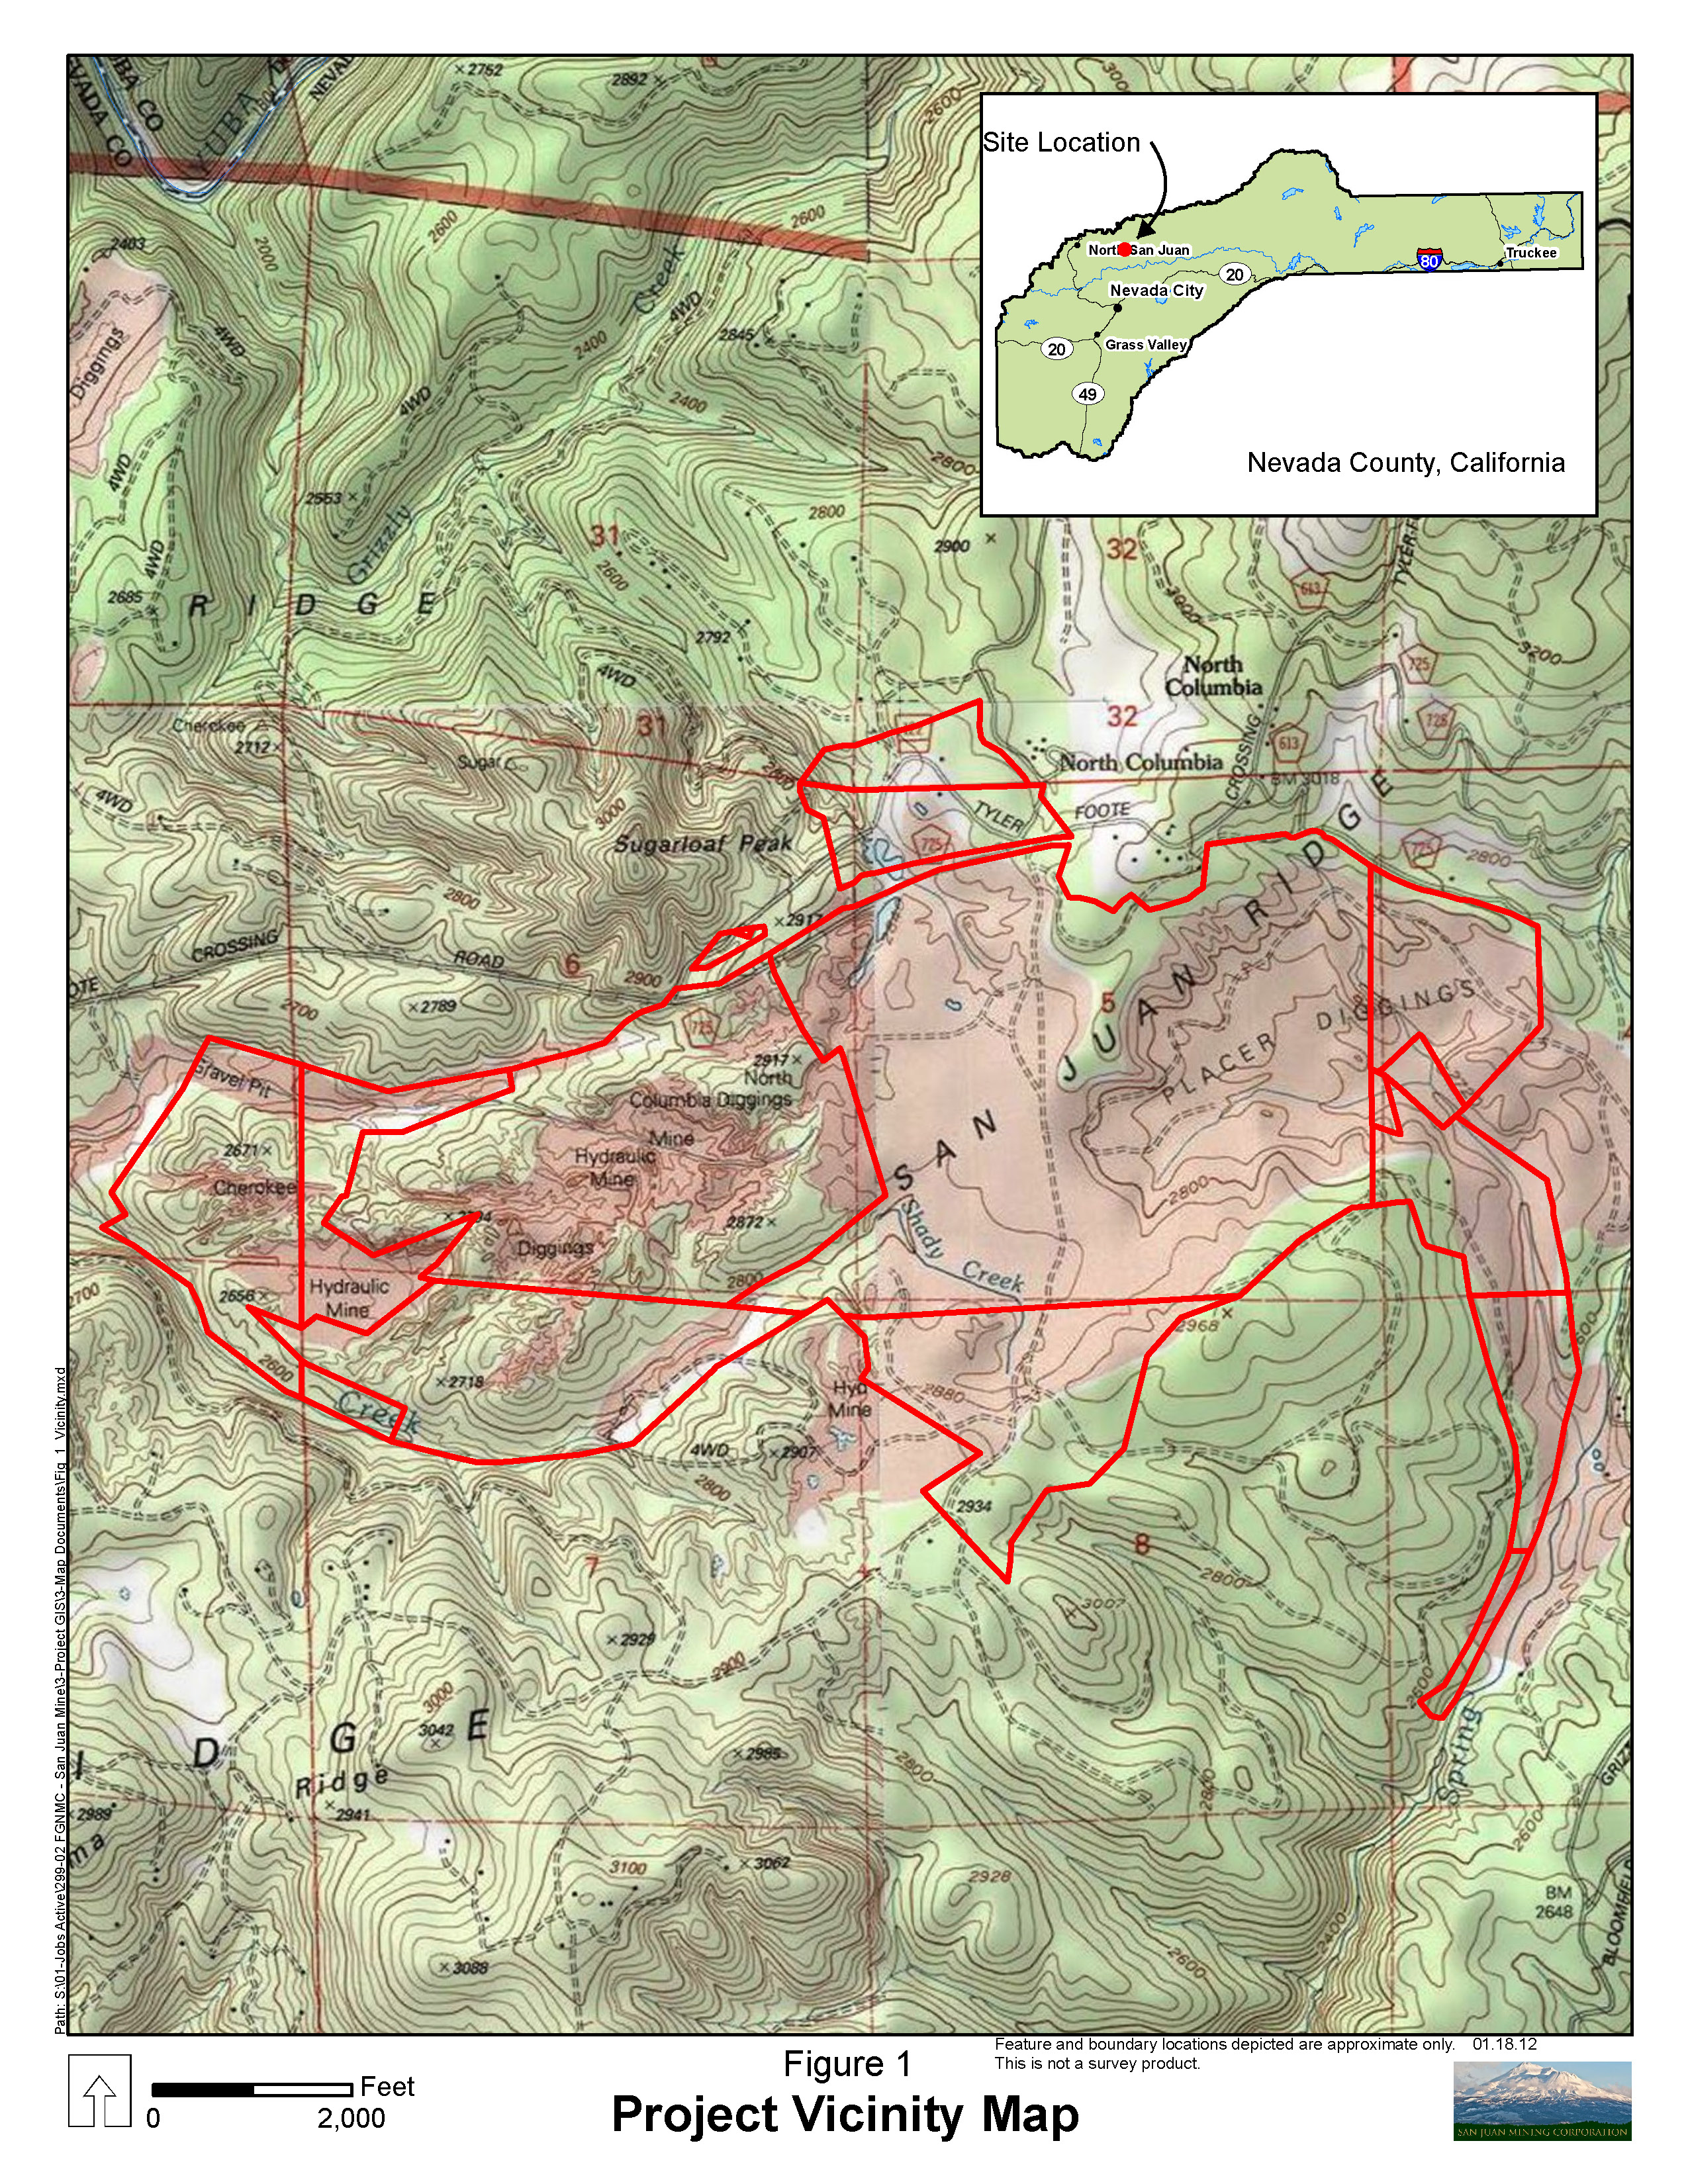 San Juan Ridge Gold Mine - Vicinity Map